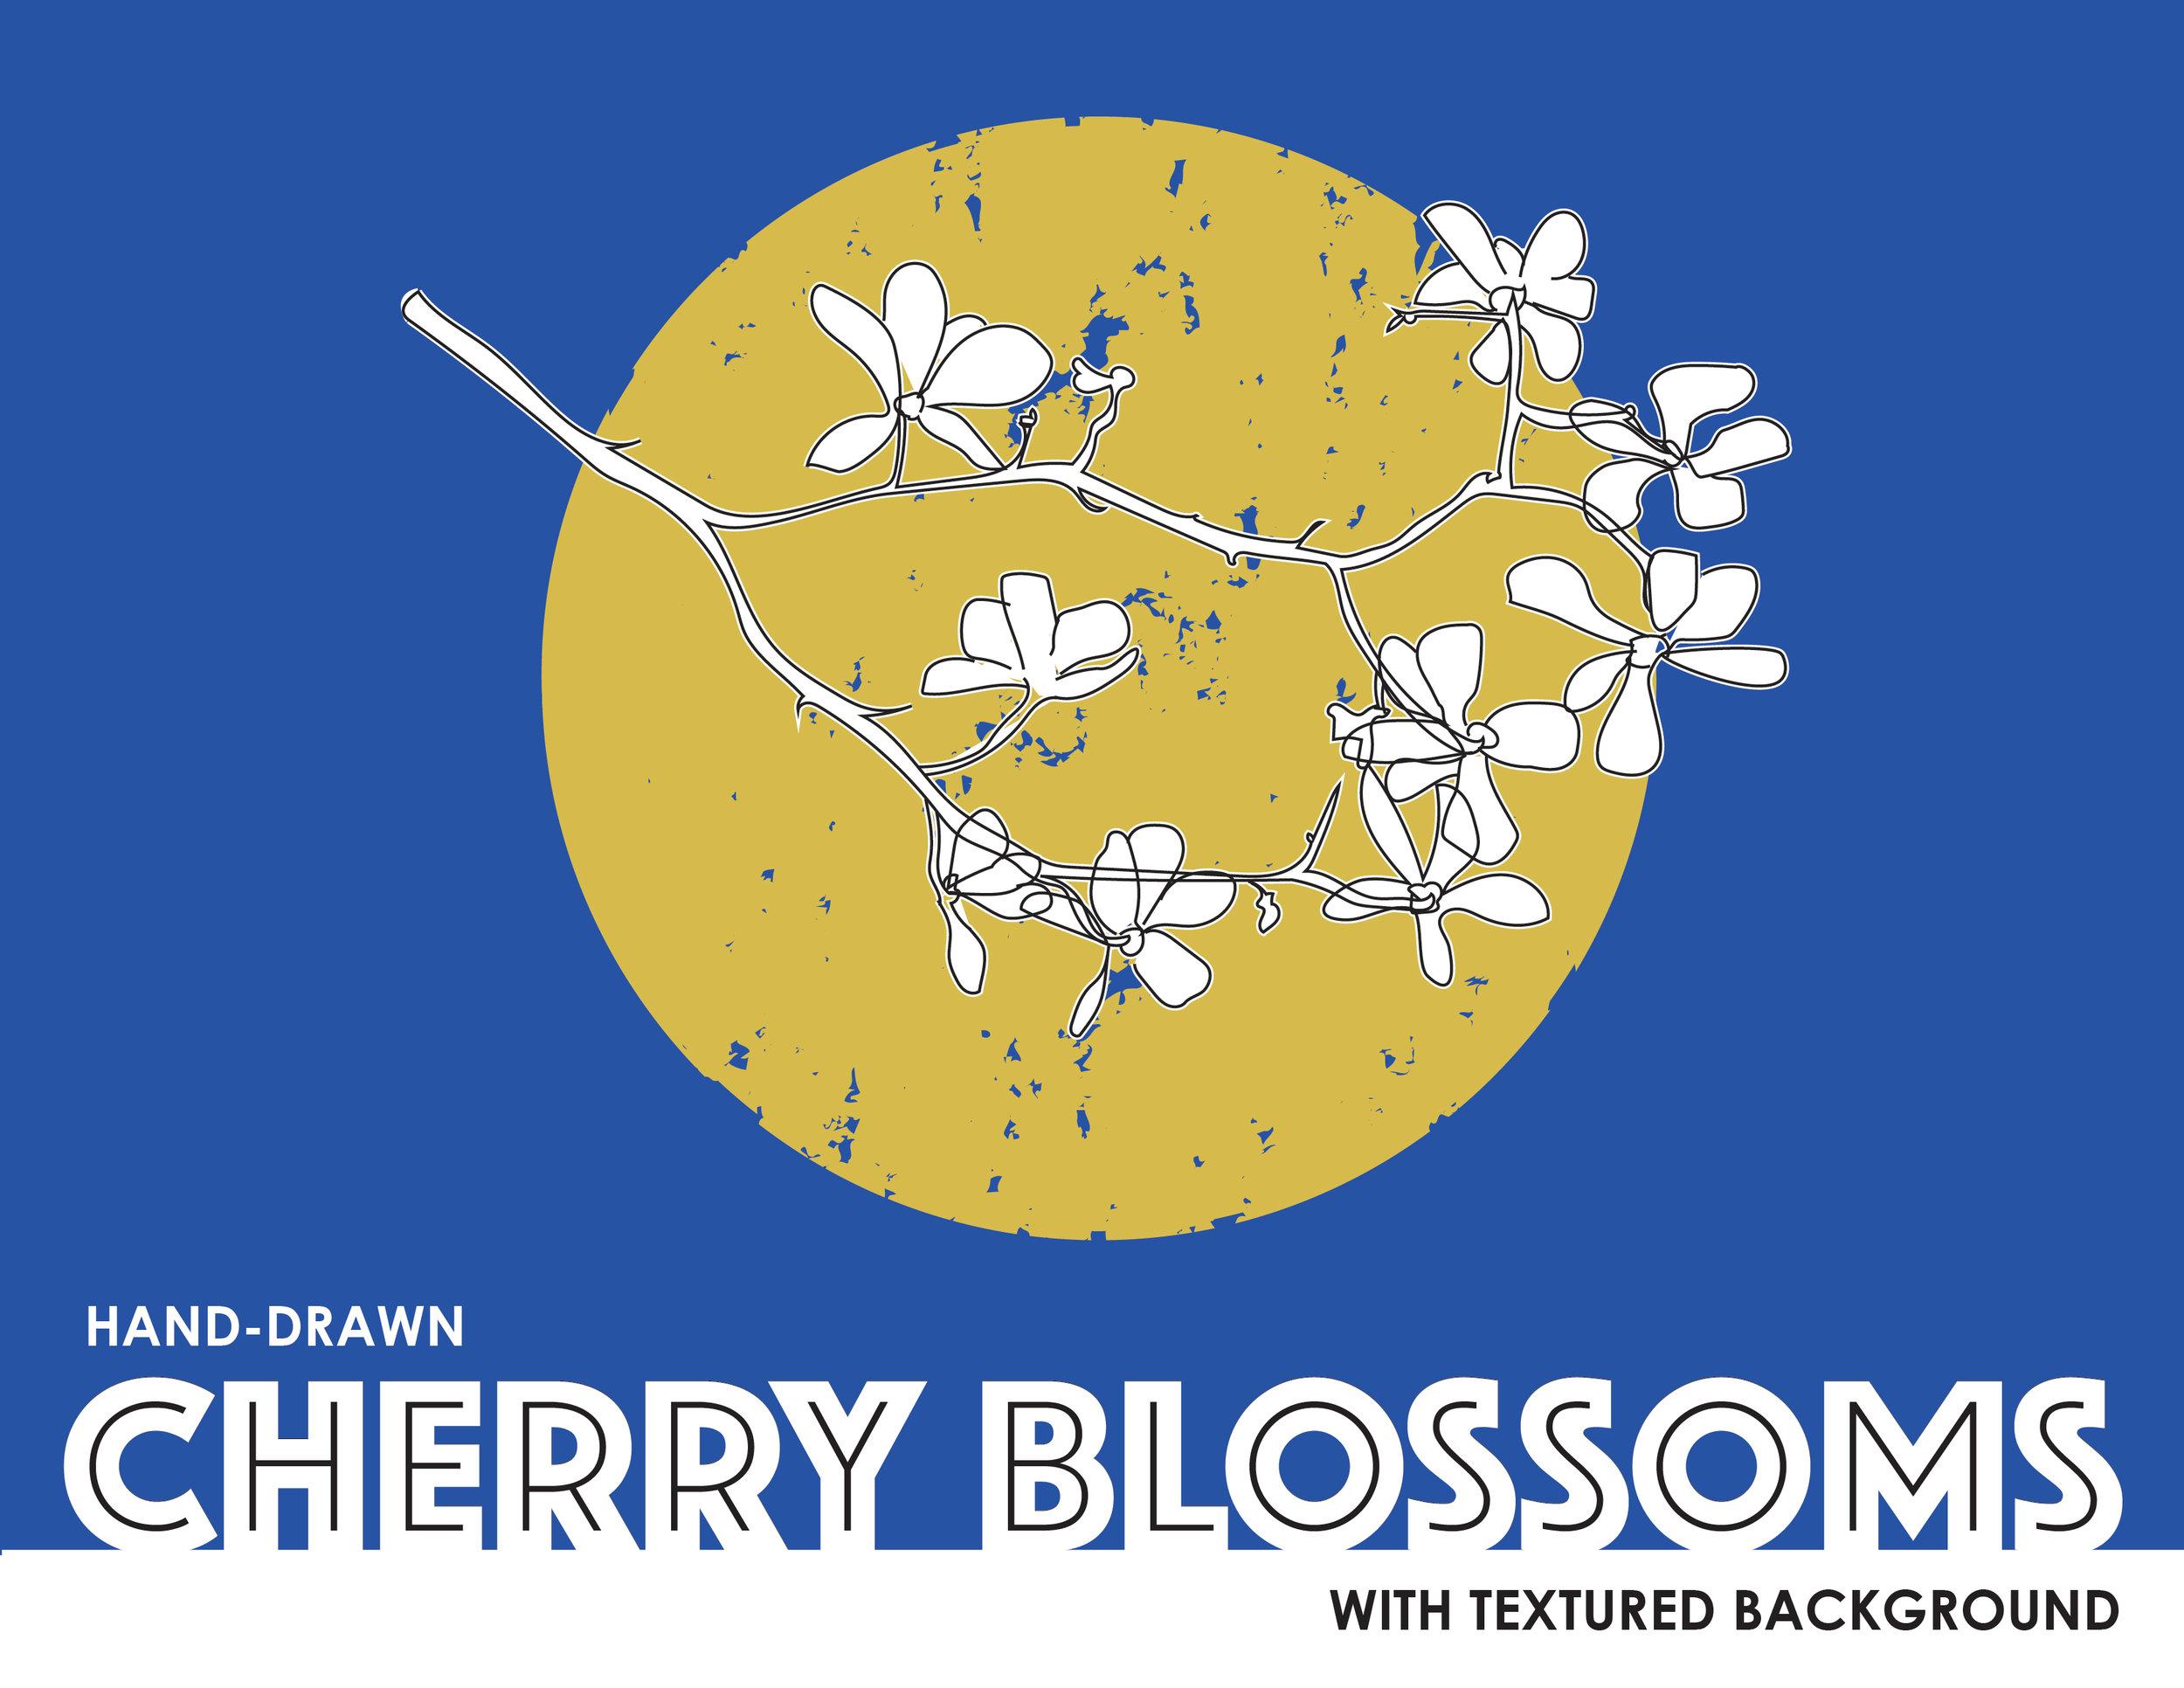 Cherry_Blossoms-Oct2018-01.jpg